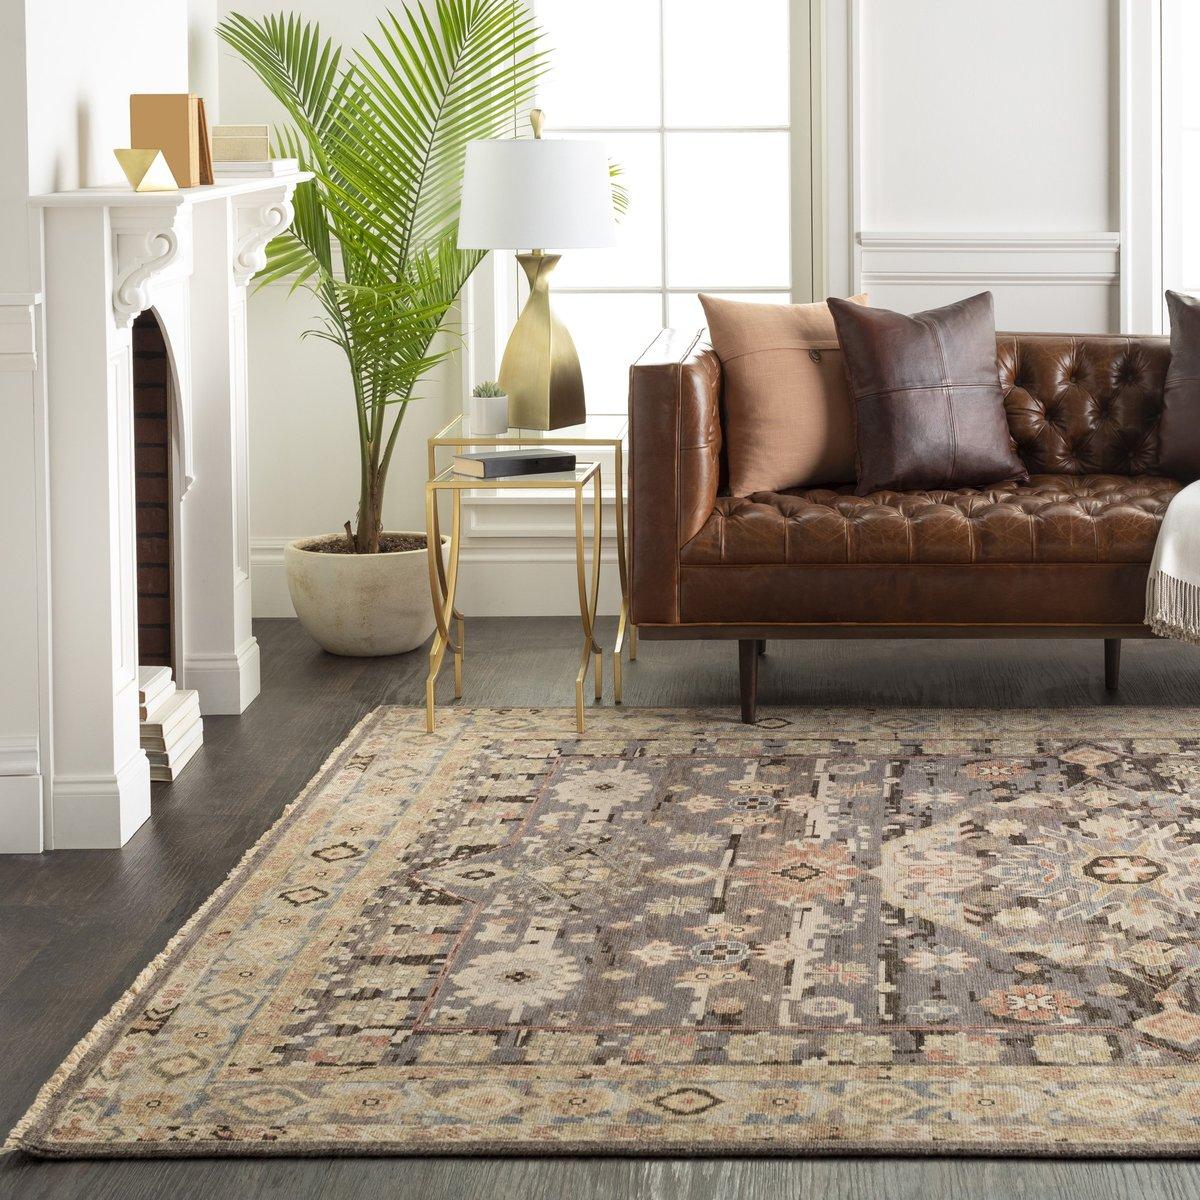 Traditional Elevation - Formal Living Room Decor Ideas